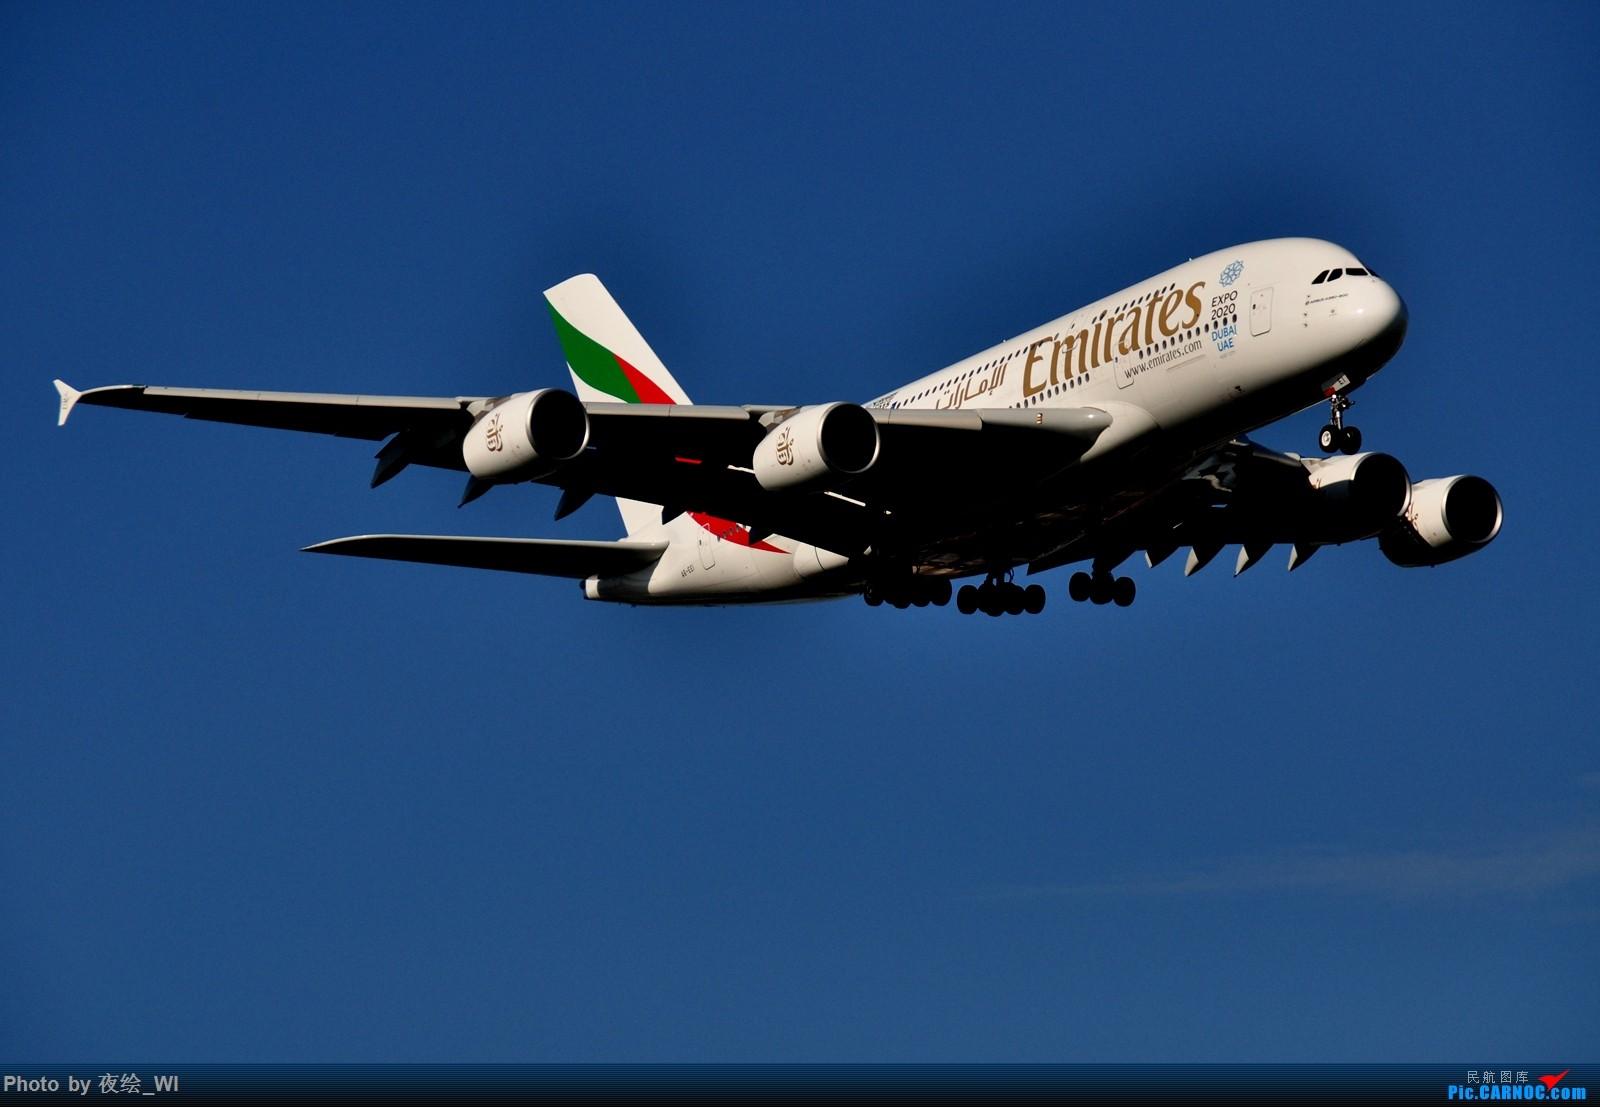 Re:[原创]【PVG】不只守着NKG,国庆疯狂拍机之浦东行,天空美得简直不像话! AIRBUS A380-800 A6-EEI 中国上海浦东国际机场